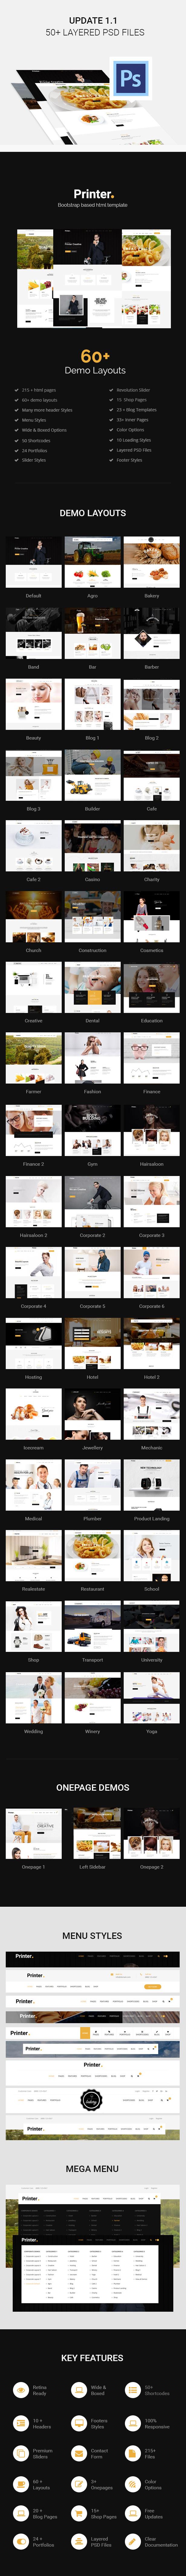 Printer - Responsive Multi-Purpose HTML5 Template - 2